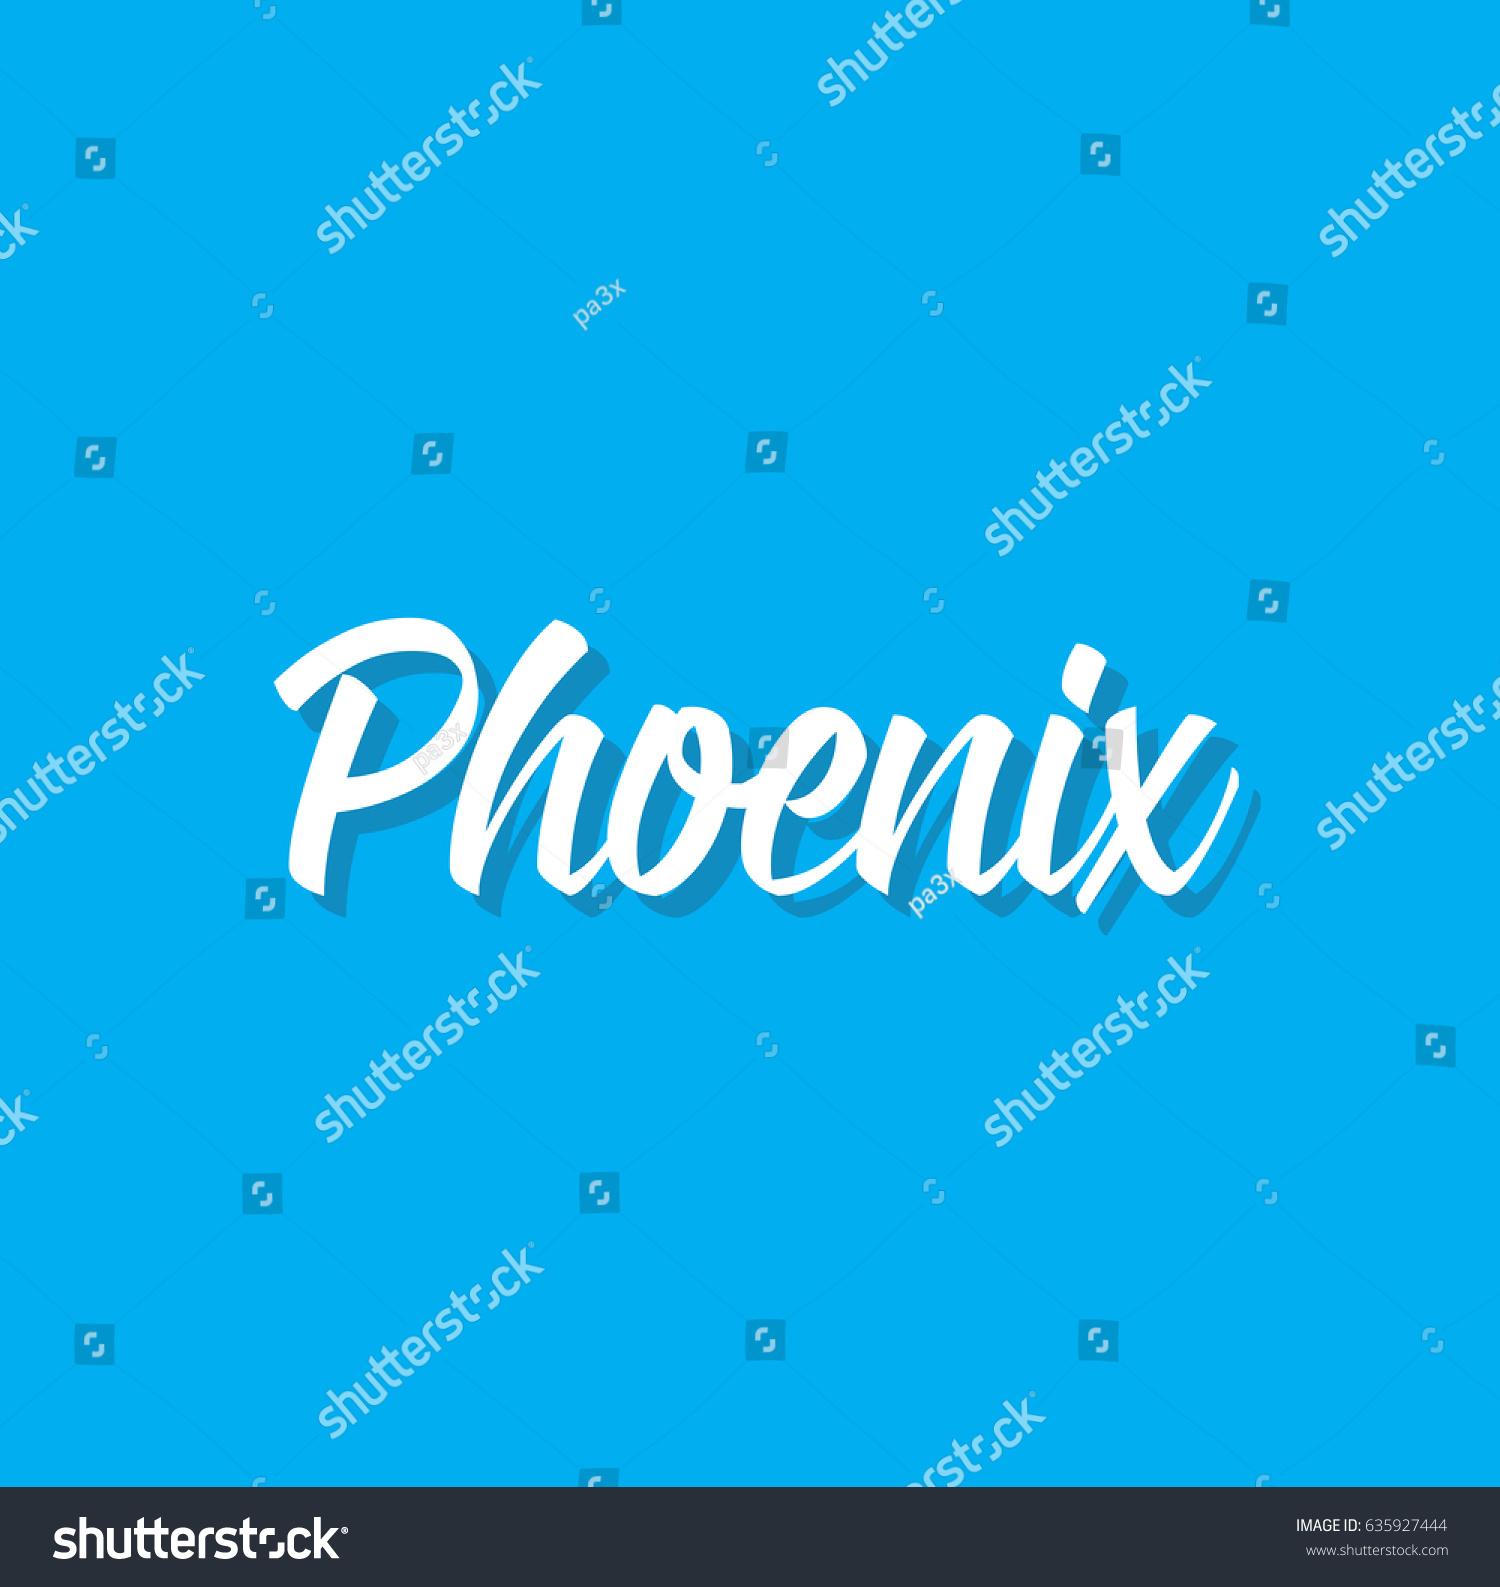 Phoenix Text Design Vector Calligraphy Typography Stock